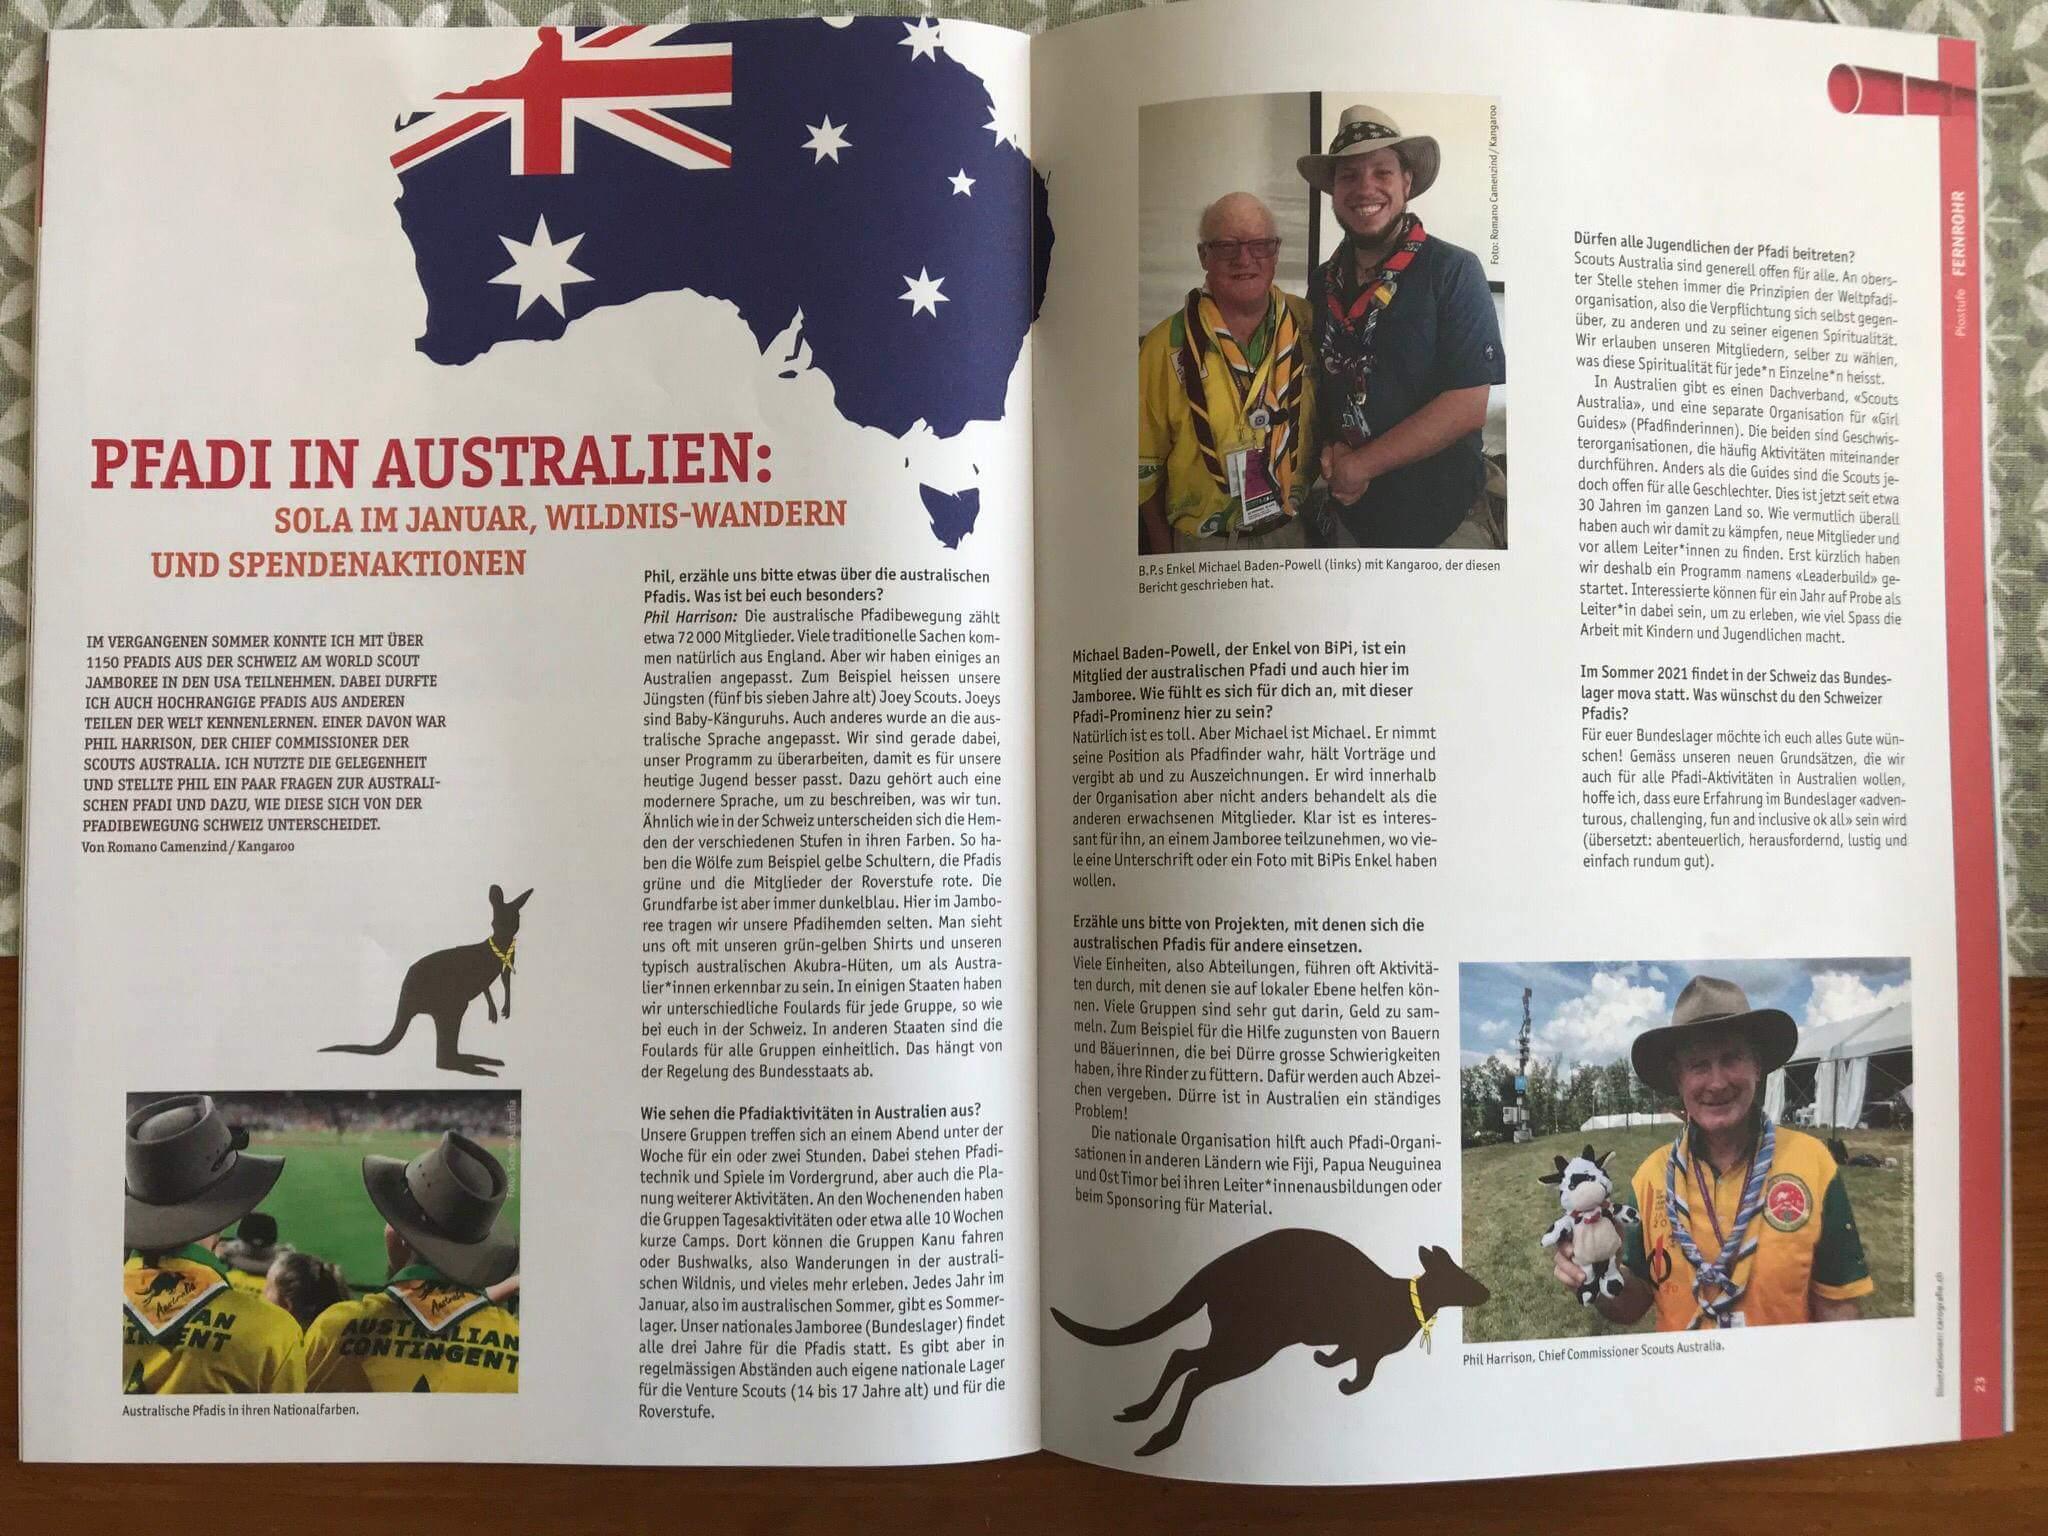 SGSM Magazine Excerpt